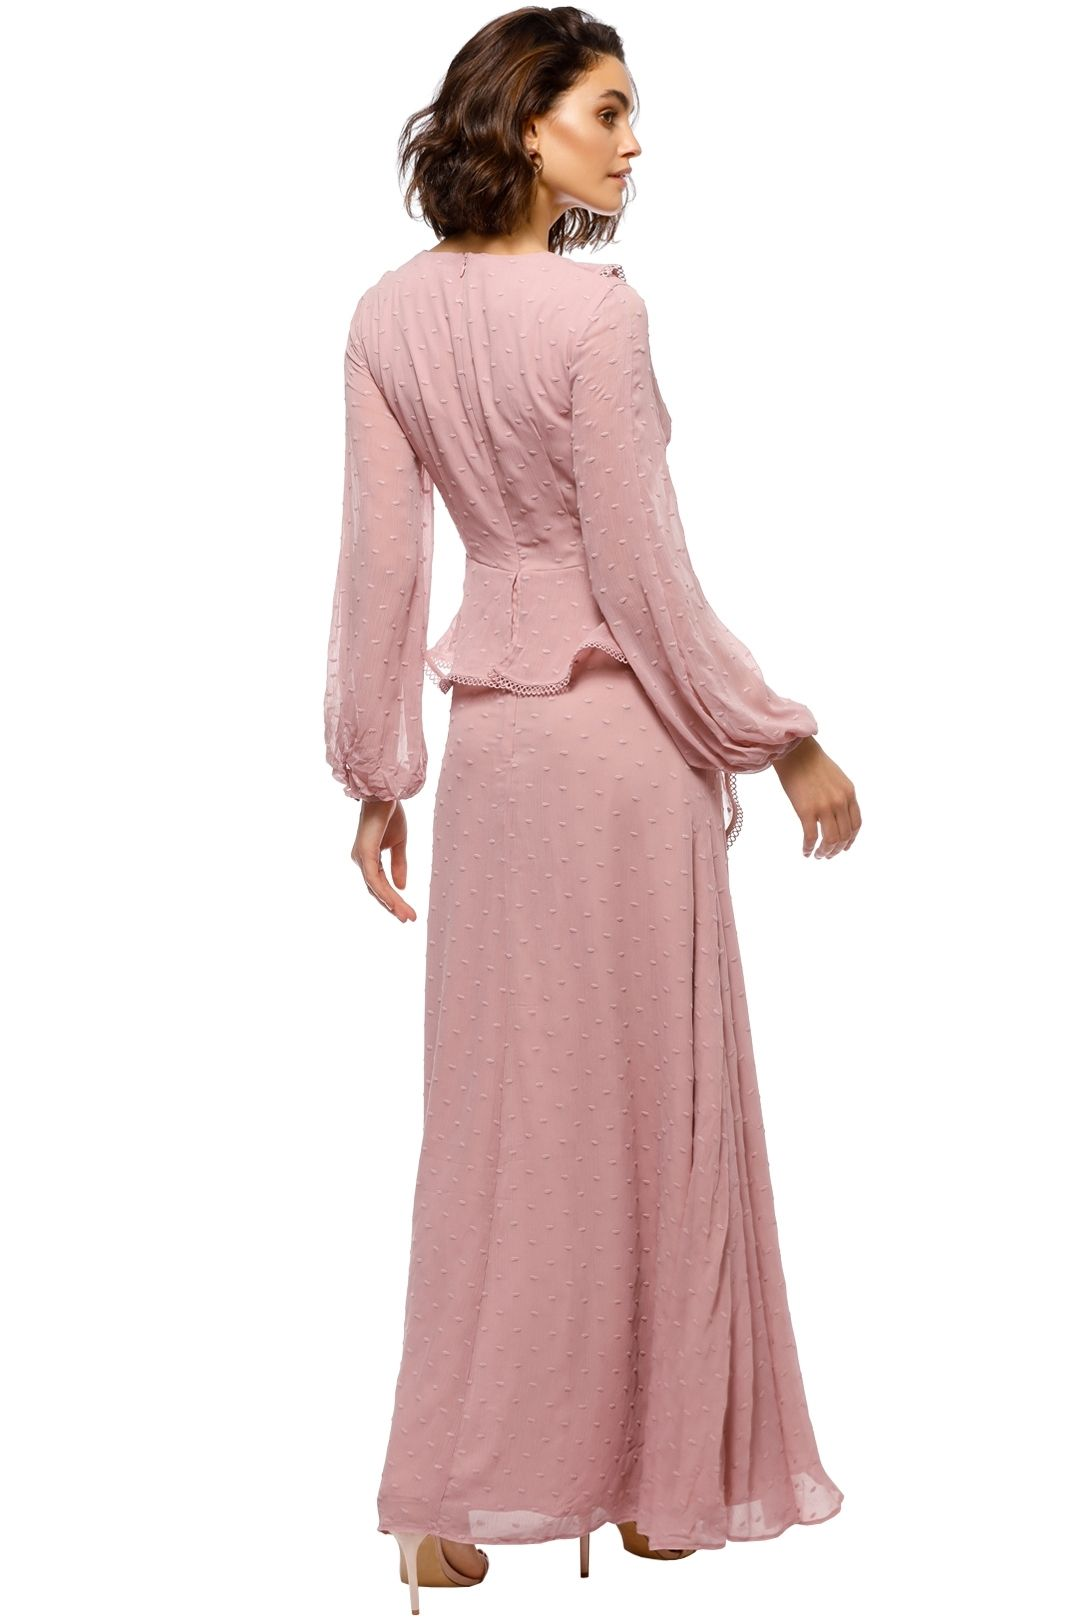 Keepsake the Label - Hideaway Gown - Pink - Back